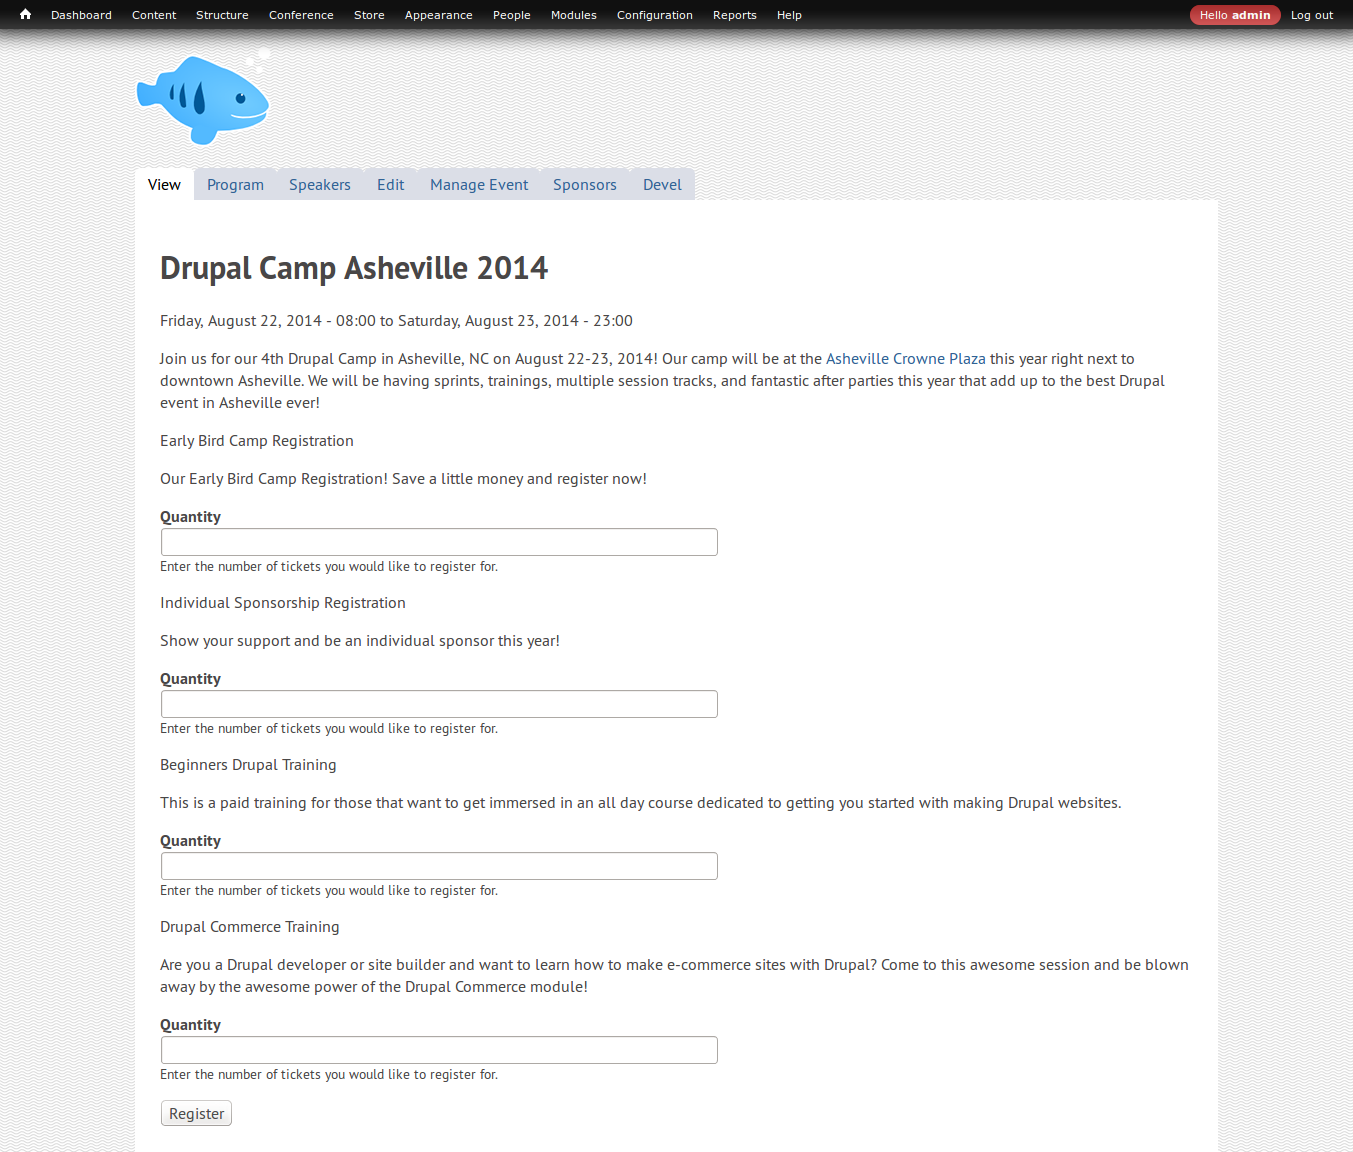 Provide Event / Conference Tickets / Registrations | Drupal.org